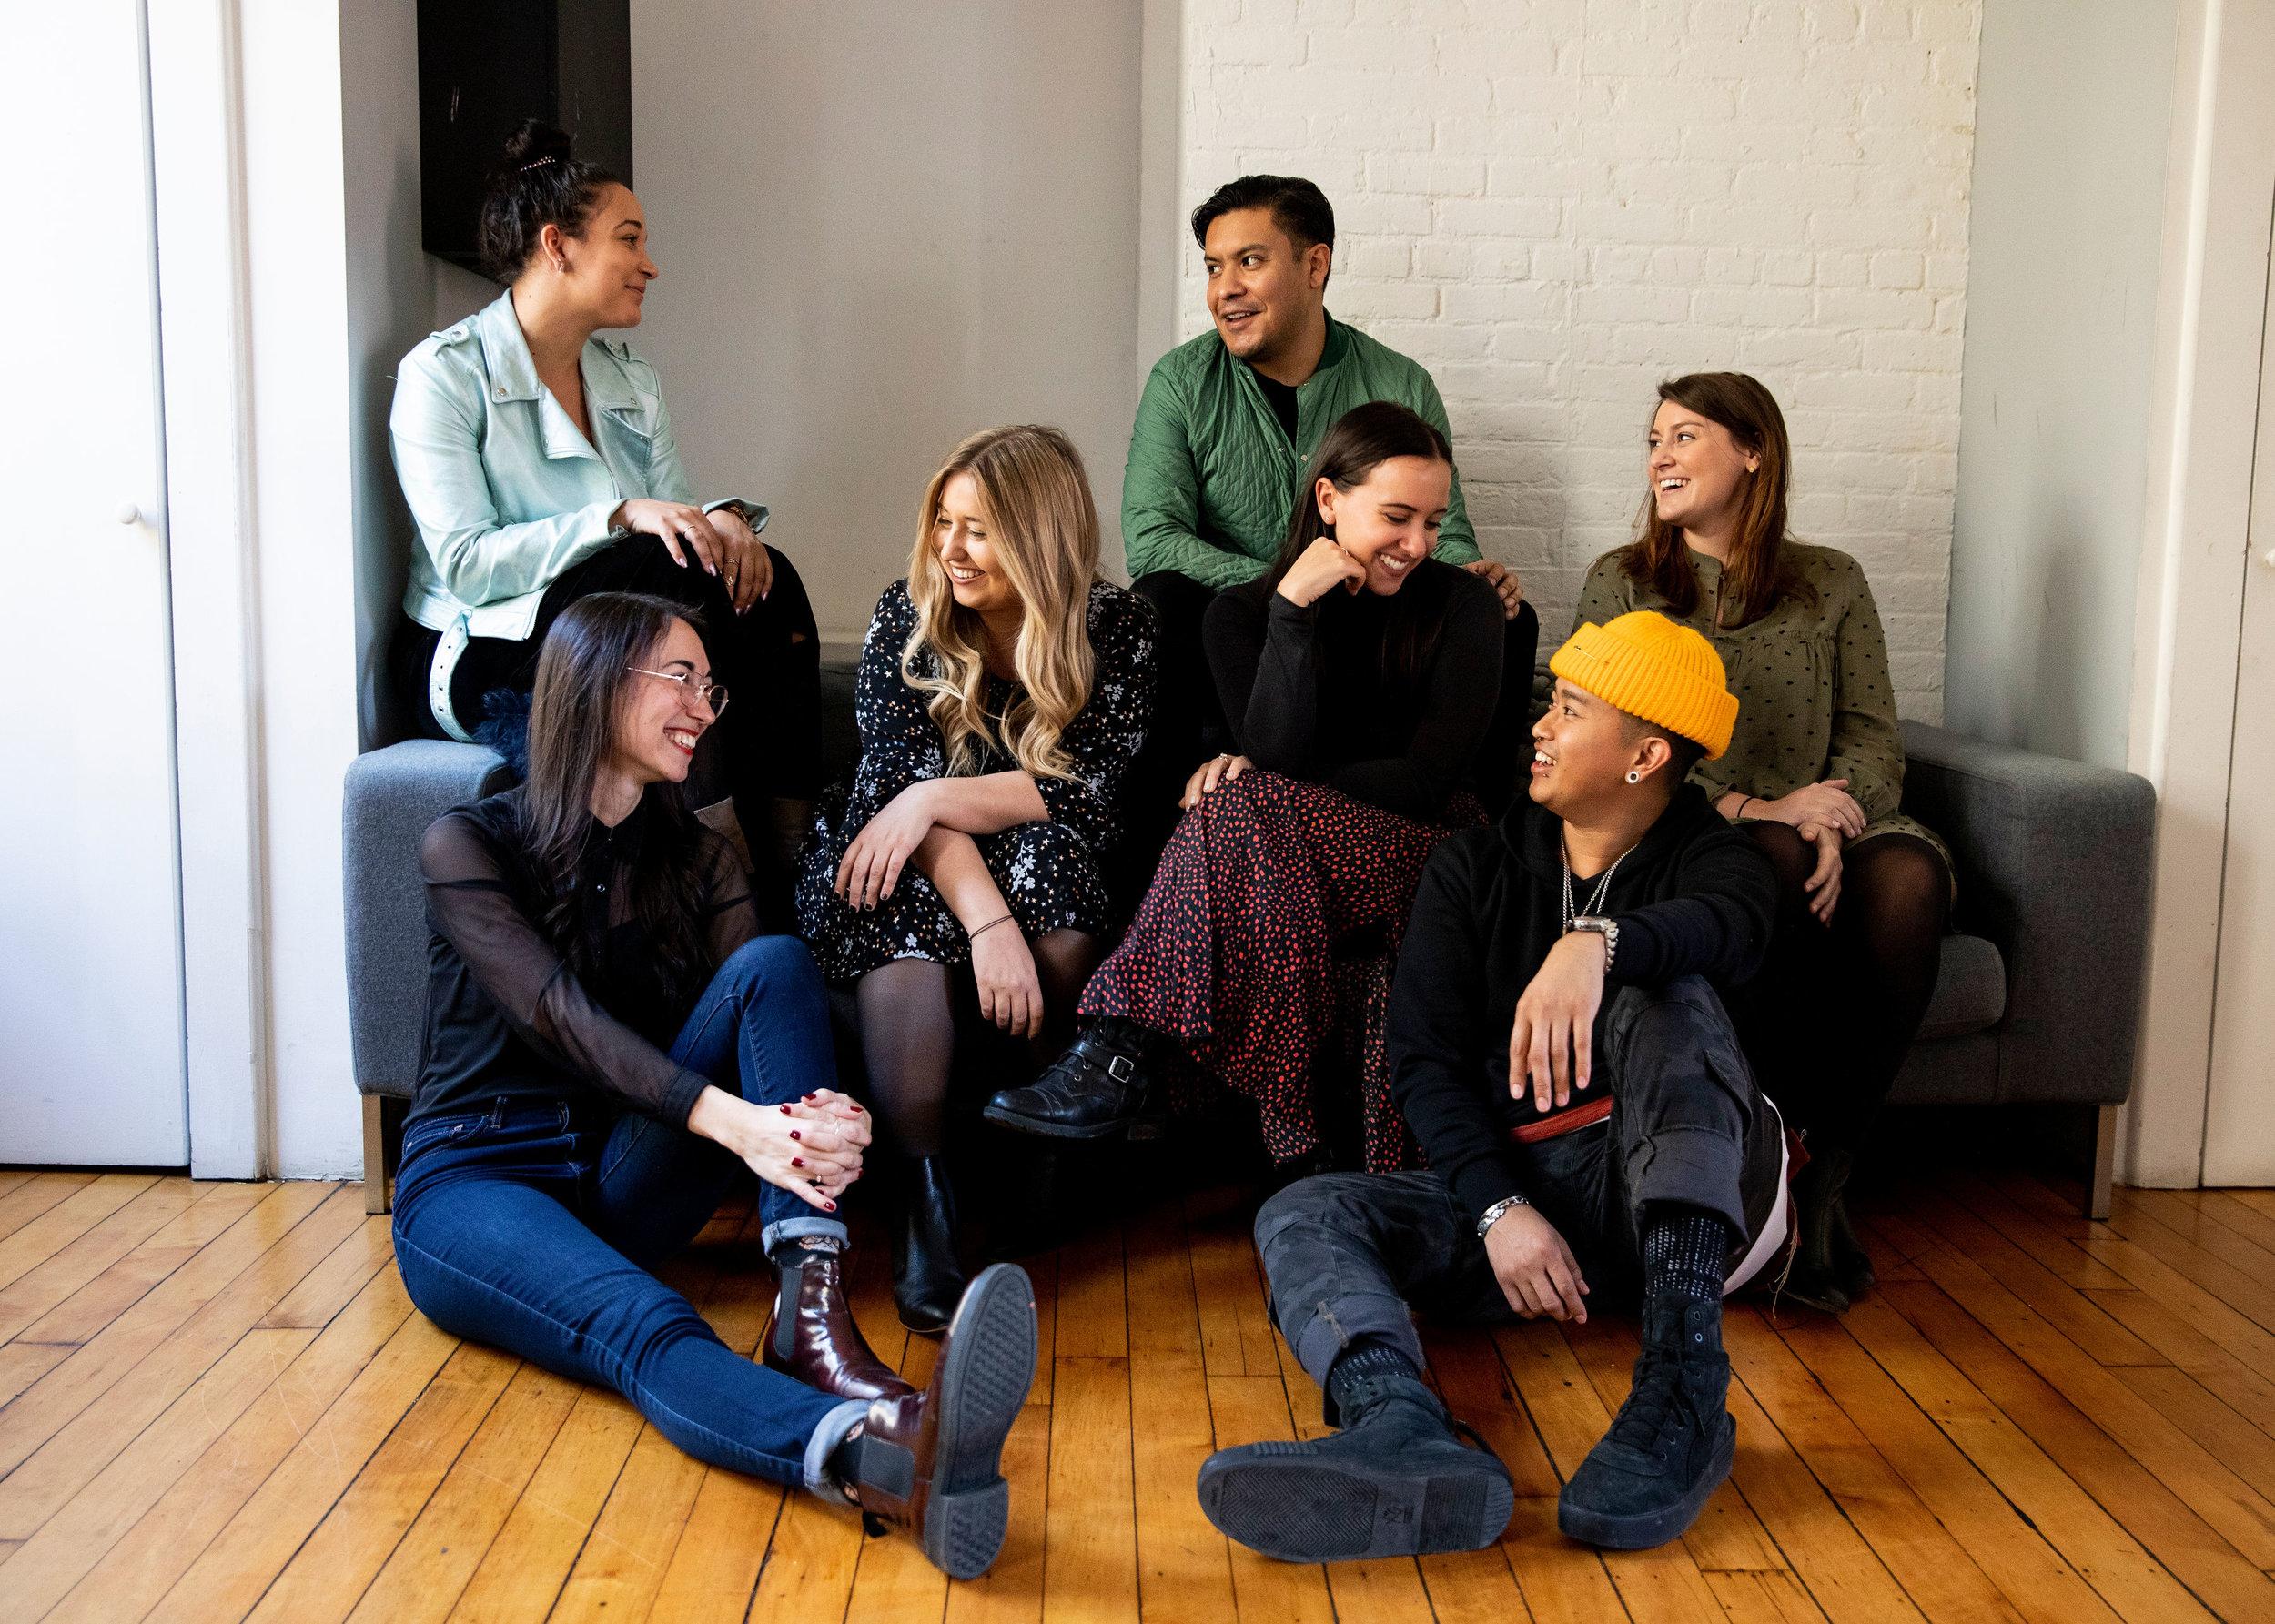 Top: Laura Linsowe-Wilson, Juan Flores Middle: Alexis Decarvelo, Cori Lehrman, Katie Kuroski Bottom: Miriam Wakim, Francis Kenneth Anunciacion